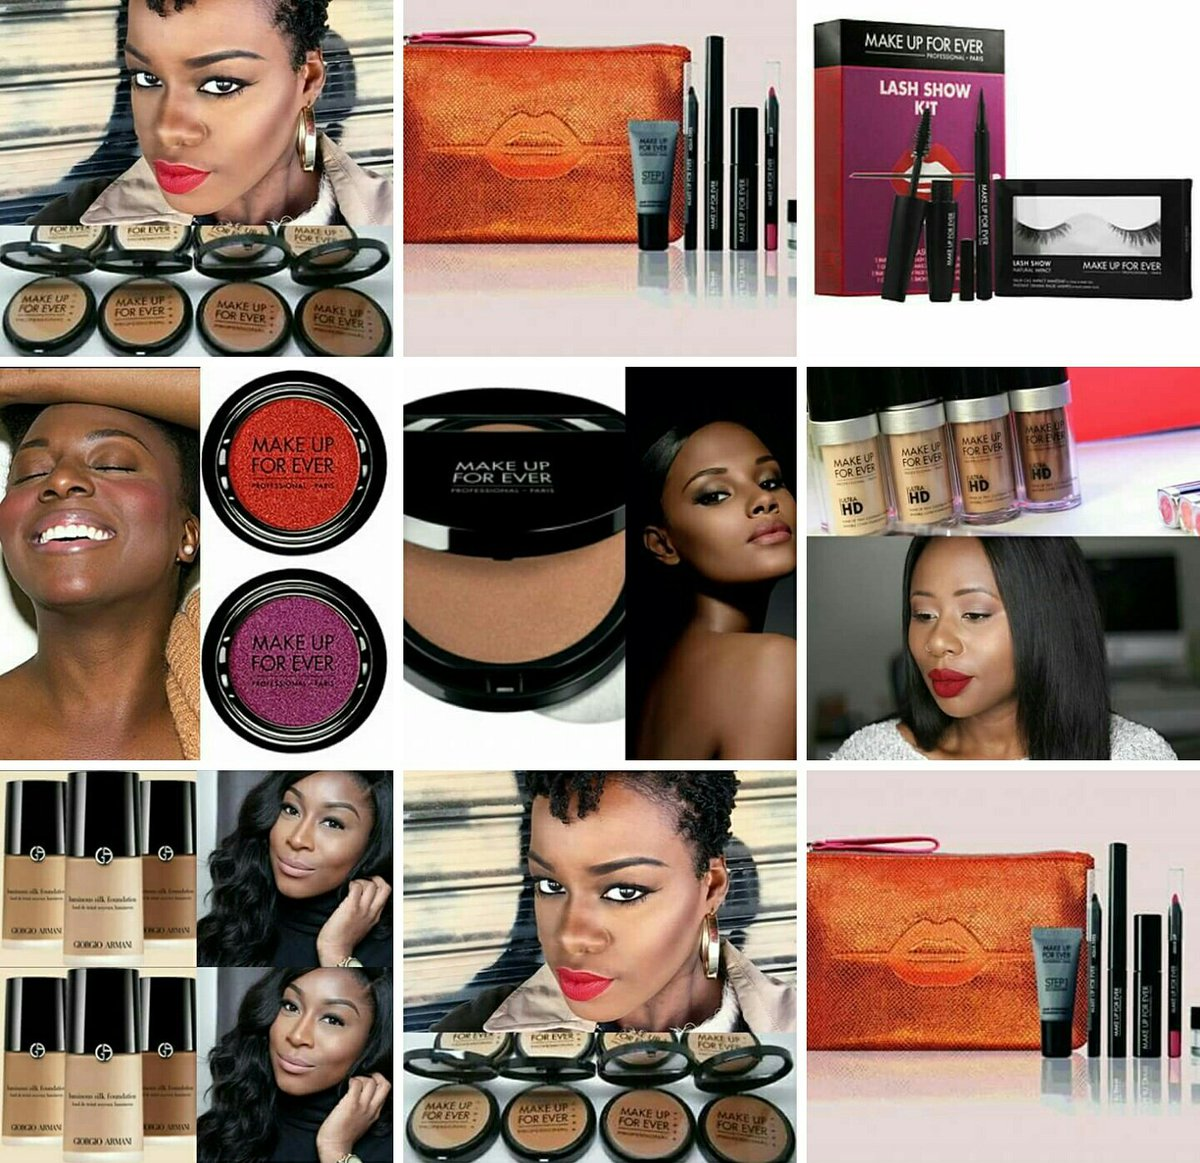 Nouveautés: Makeup Forever Lancome Armani #MakeupAddict #beautyaddict #thearabeauty #Dakar<br>http://pic.twitter.com/o8l2QOEVMm